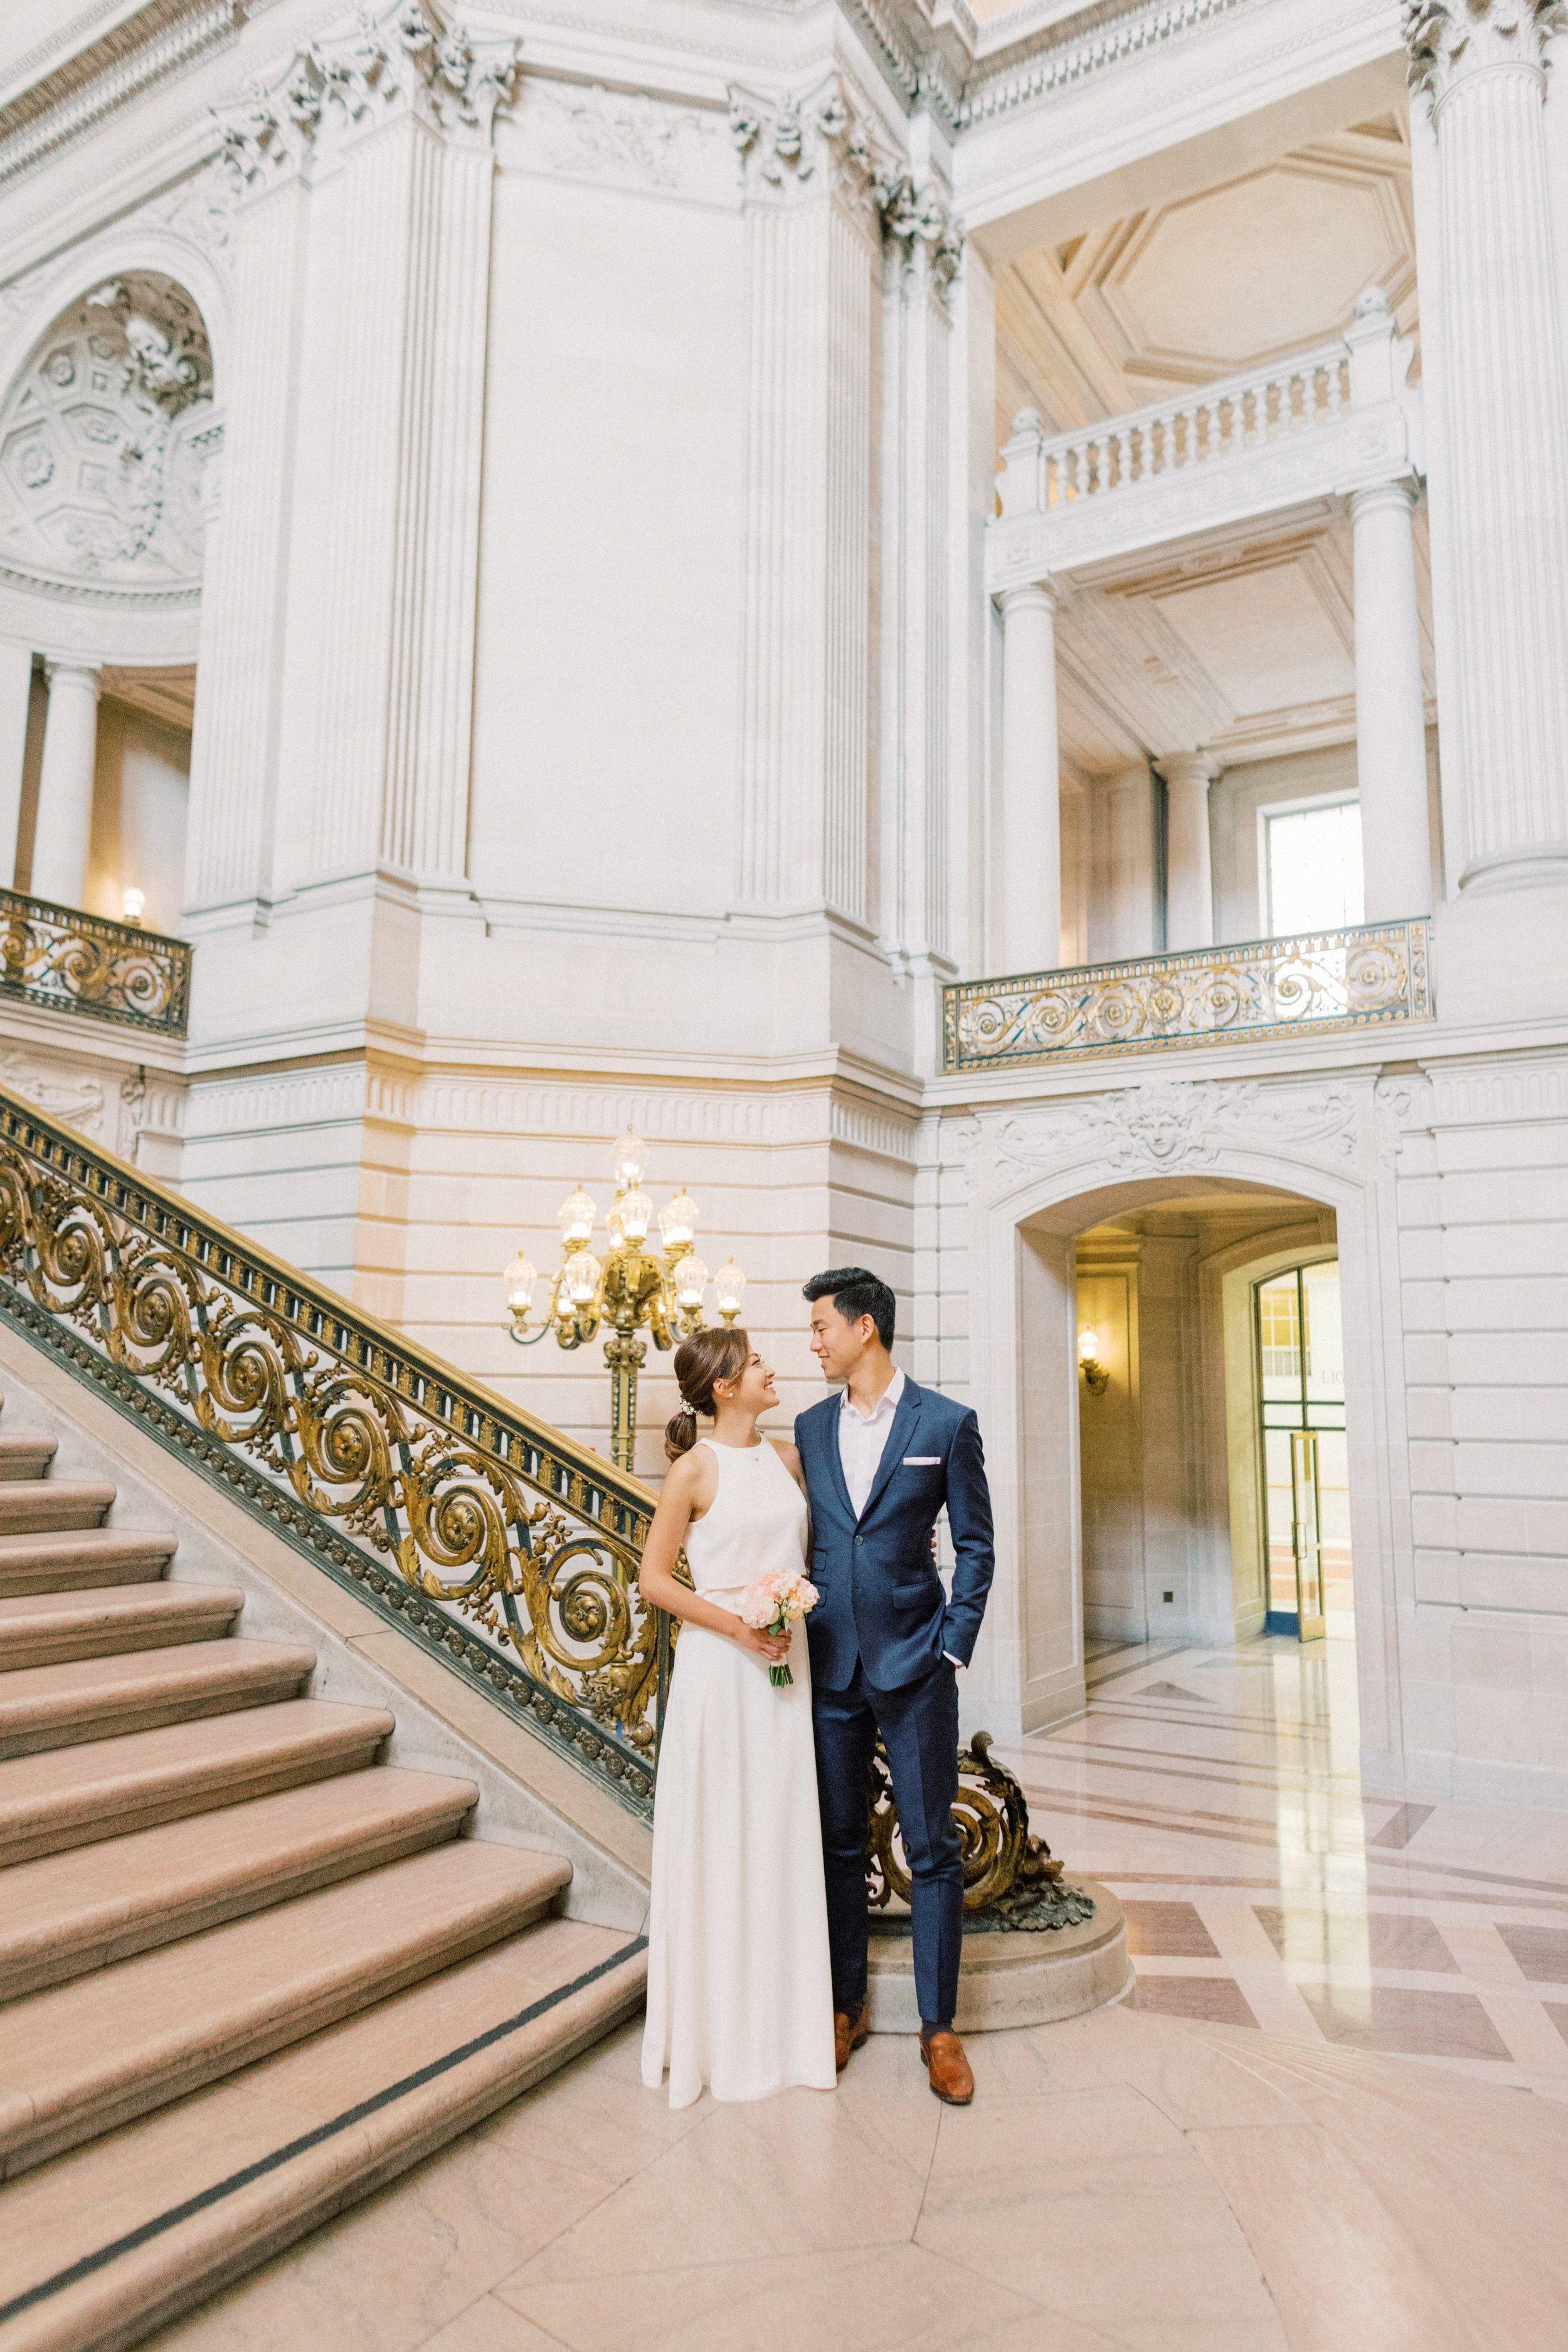 San-francisco-city-hall-photography-wedding-063.jpg